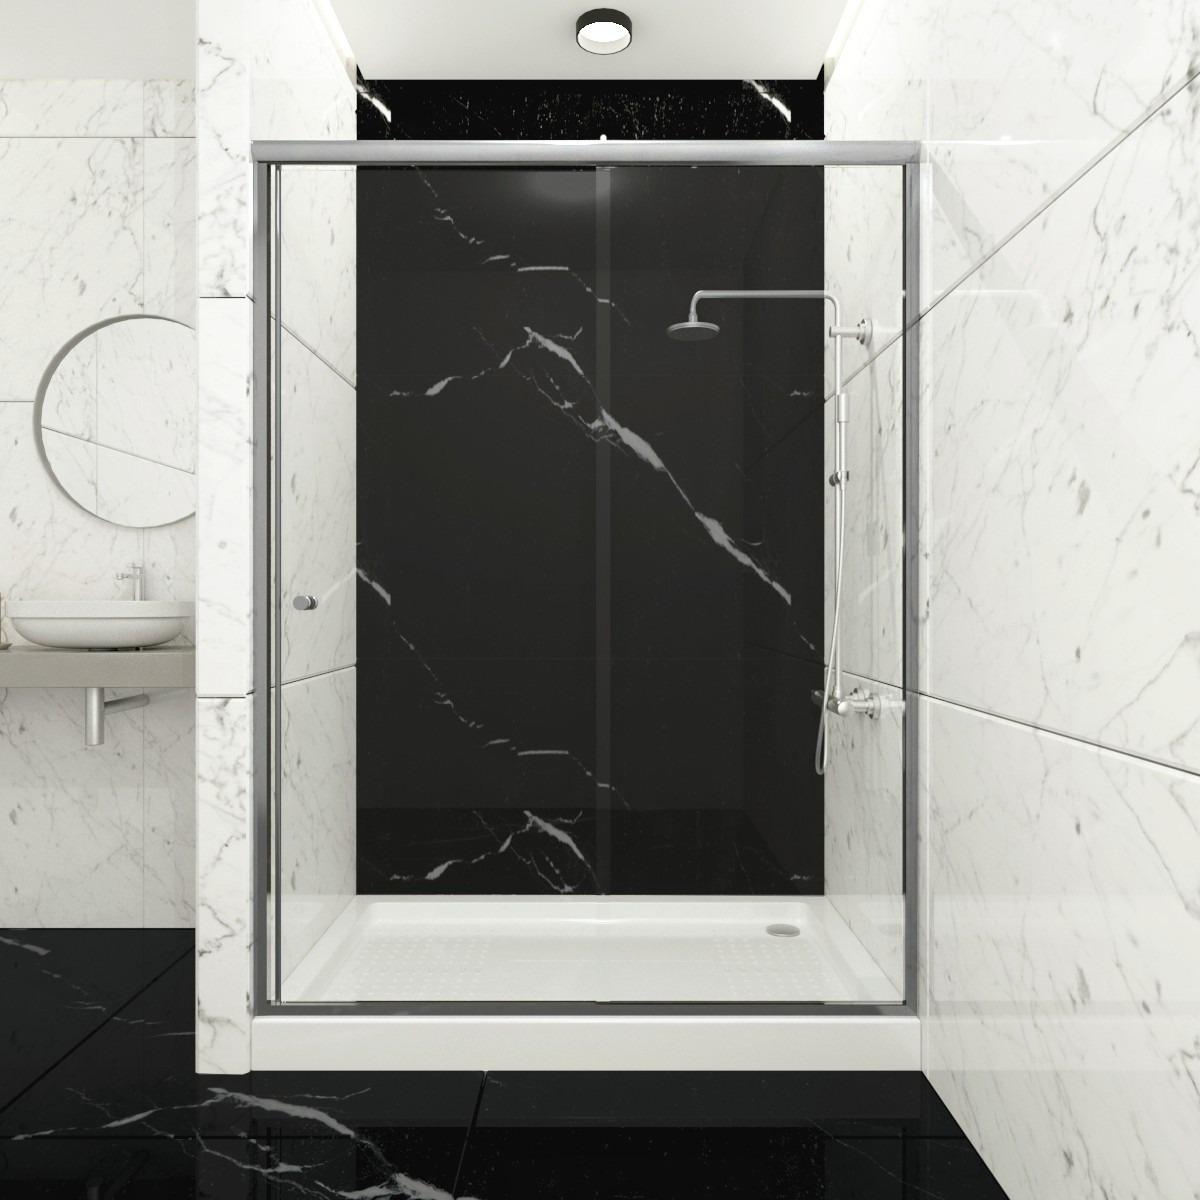 Mampara de Ducha Puerta Corredera vidrio templado transparente 120x190cm